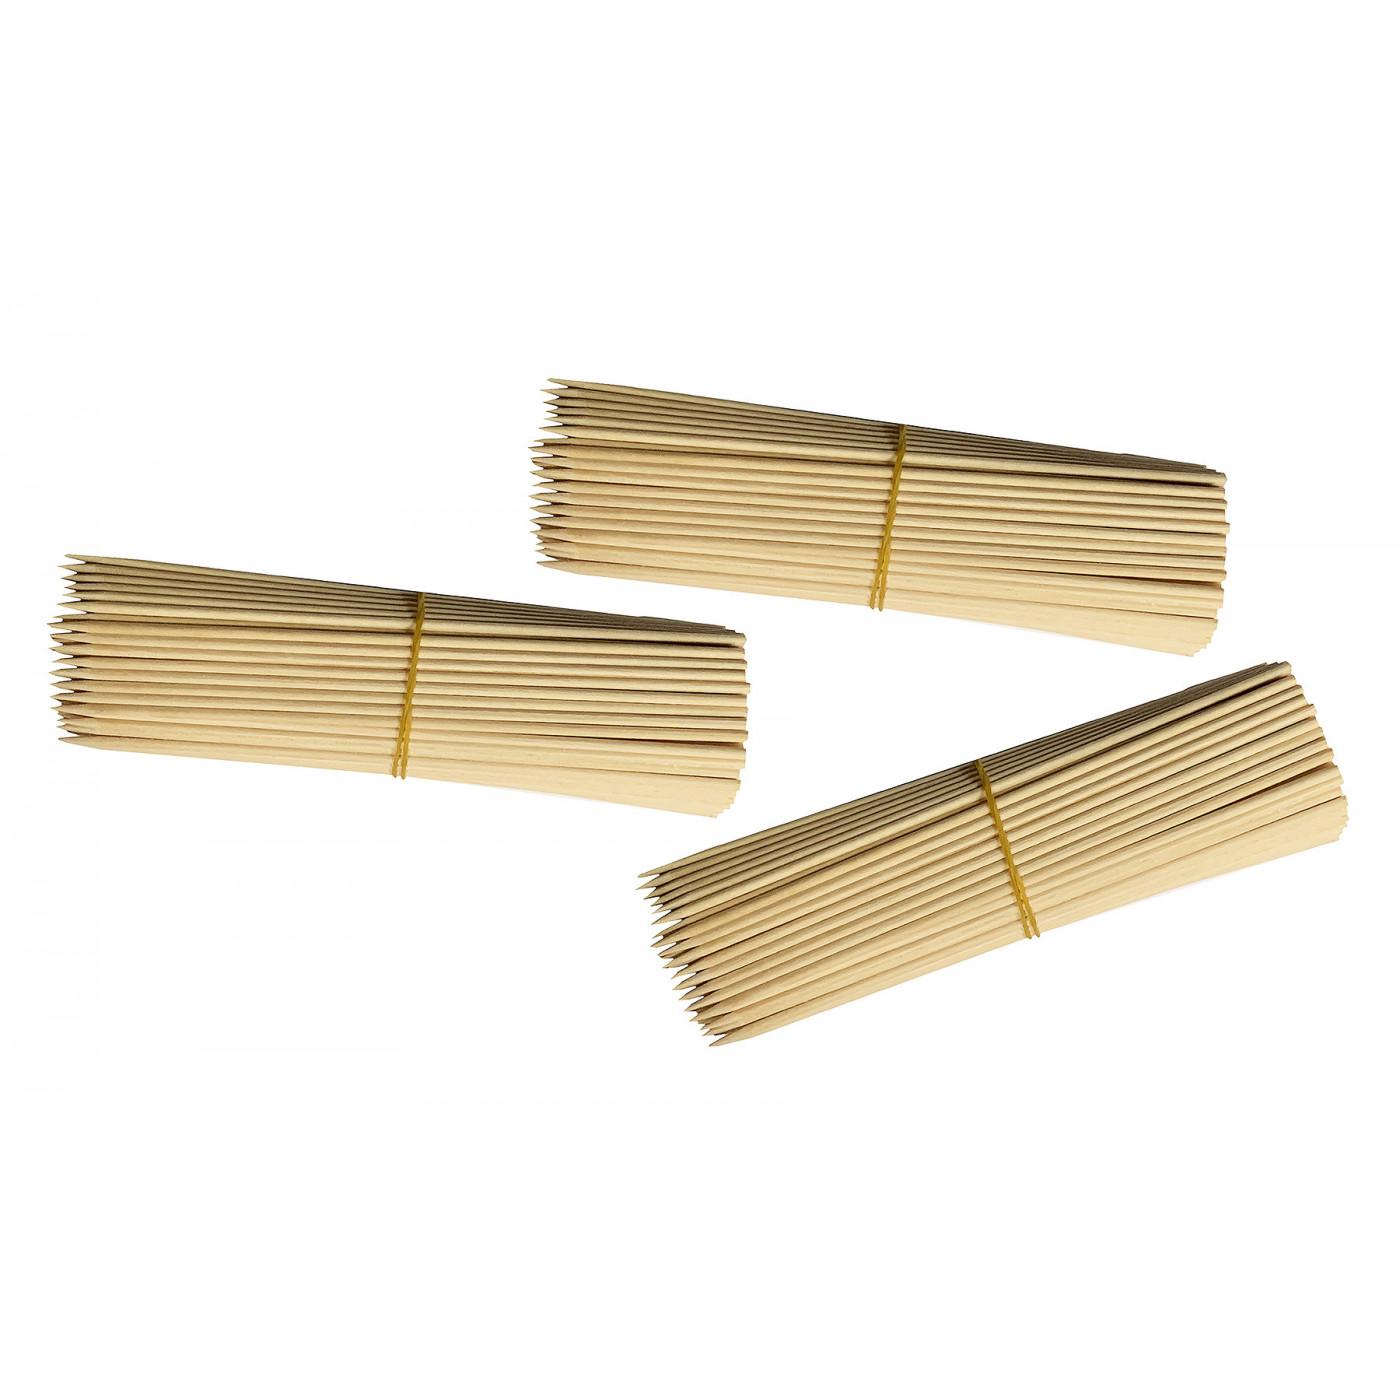 Set of 750 wooden sticks (3 mm x 18 cm, birch wood)  - 1